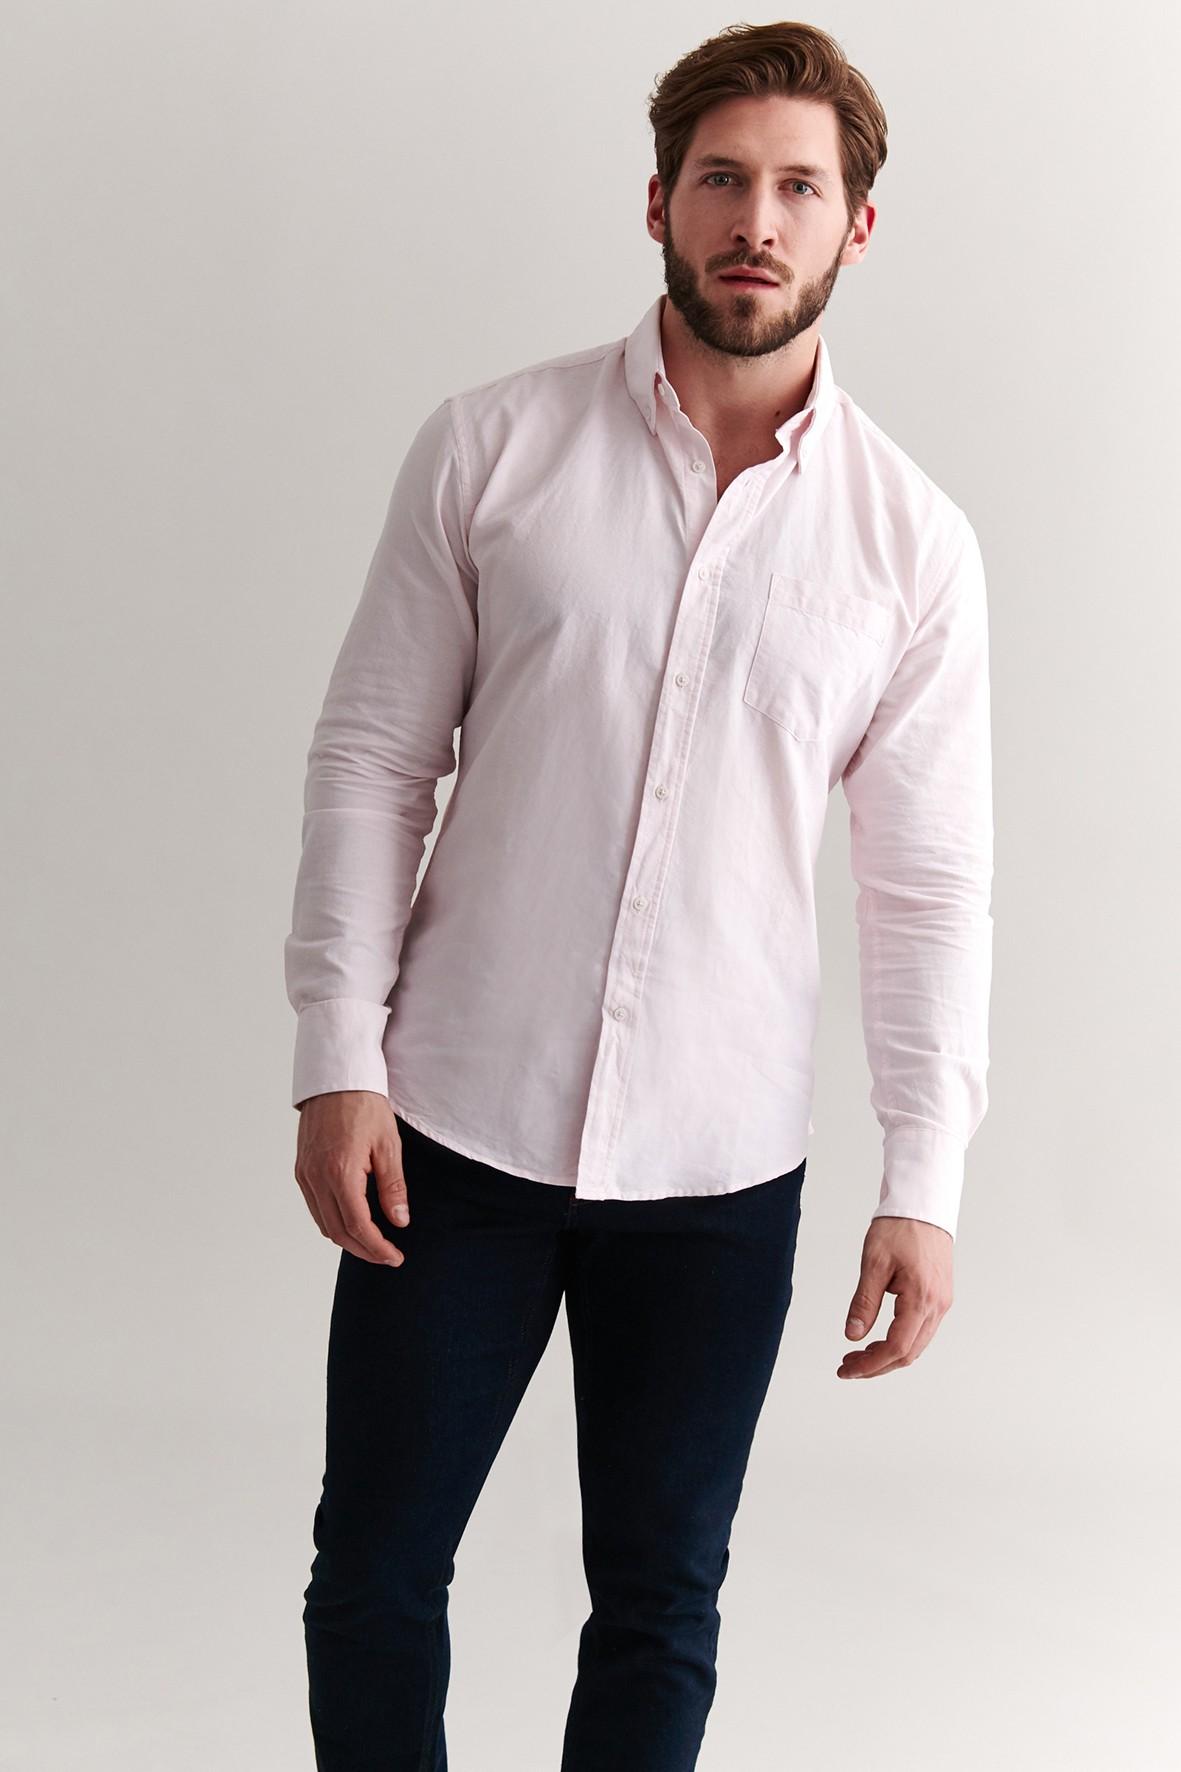 Bawełniana koszula męska - różowa Tatuum